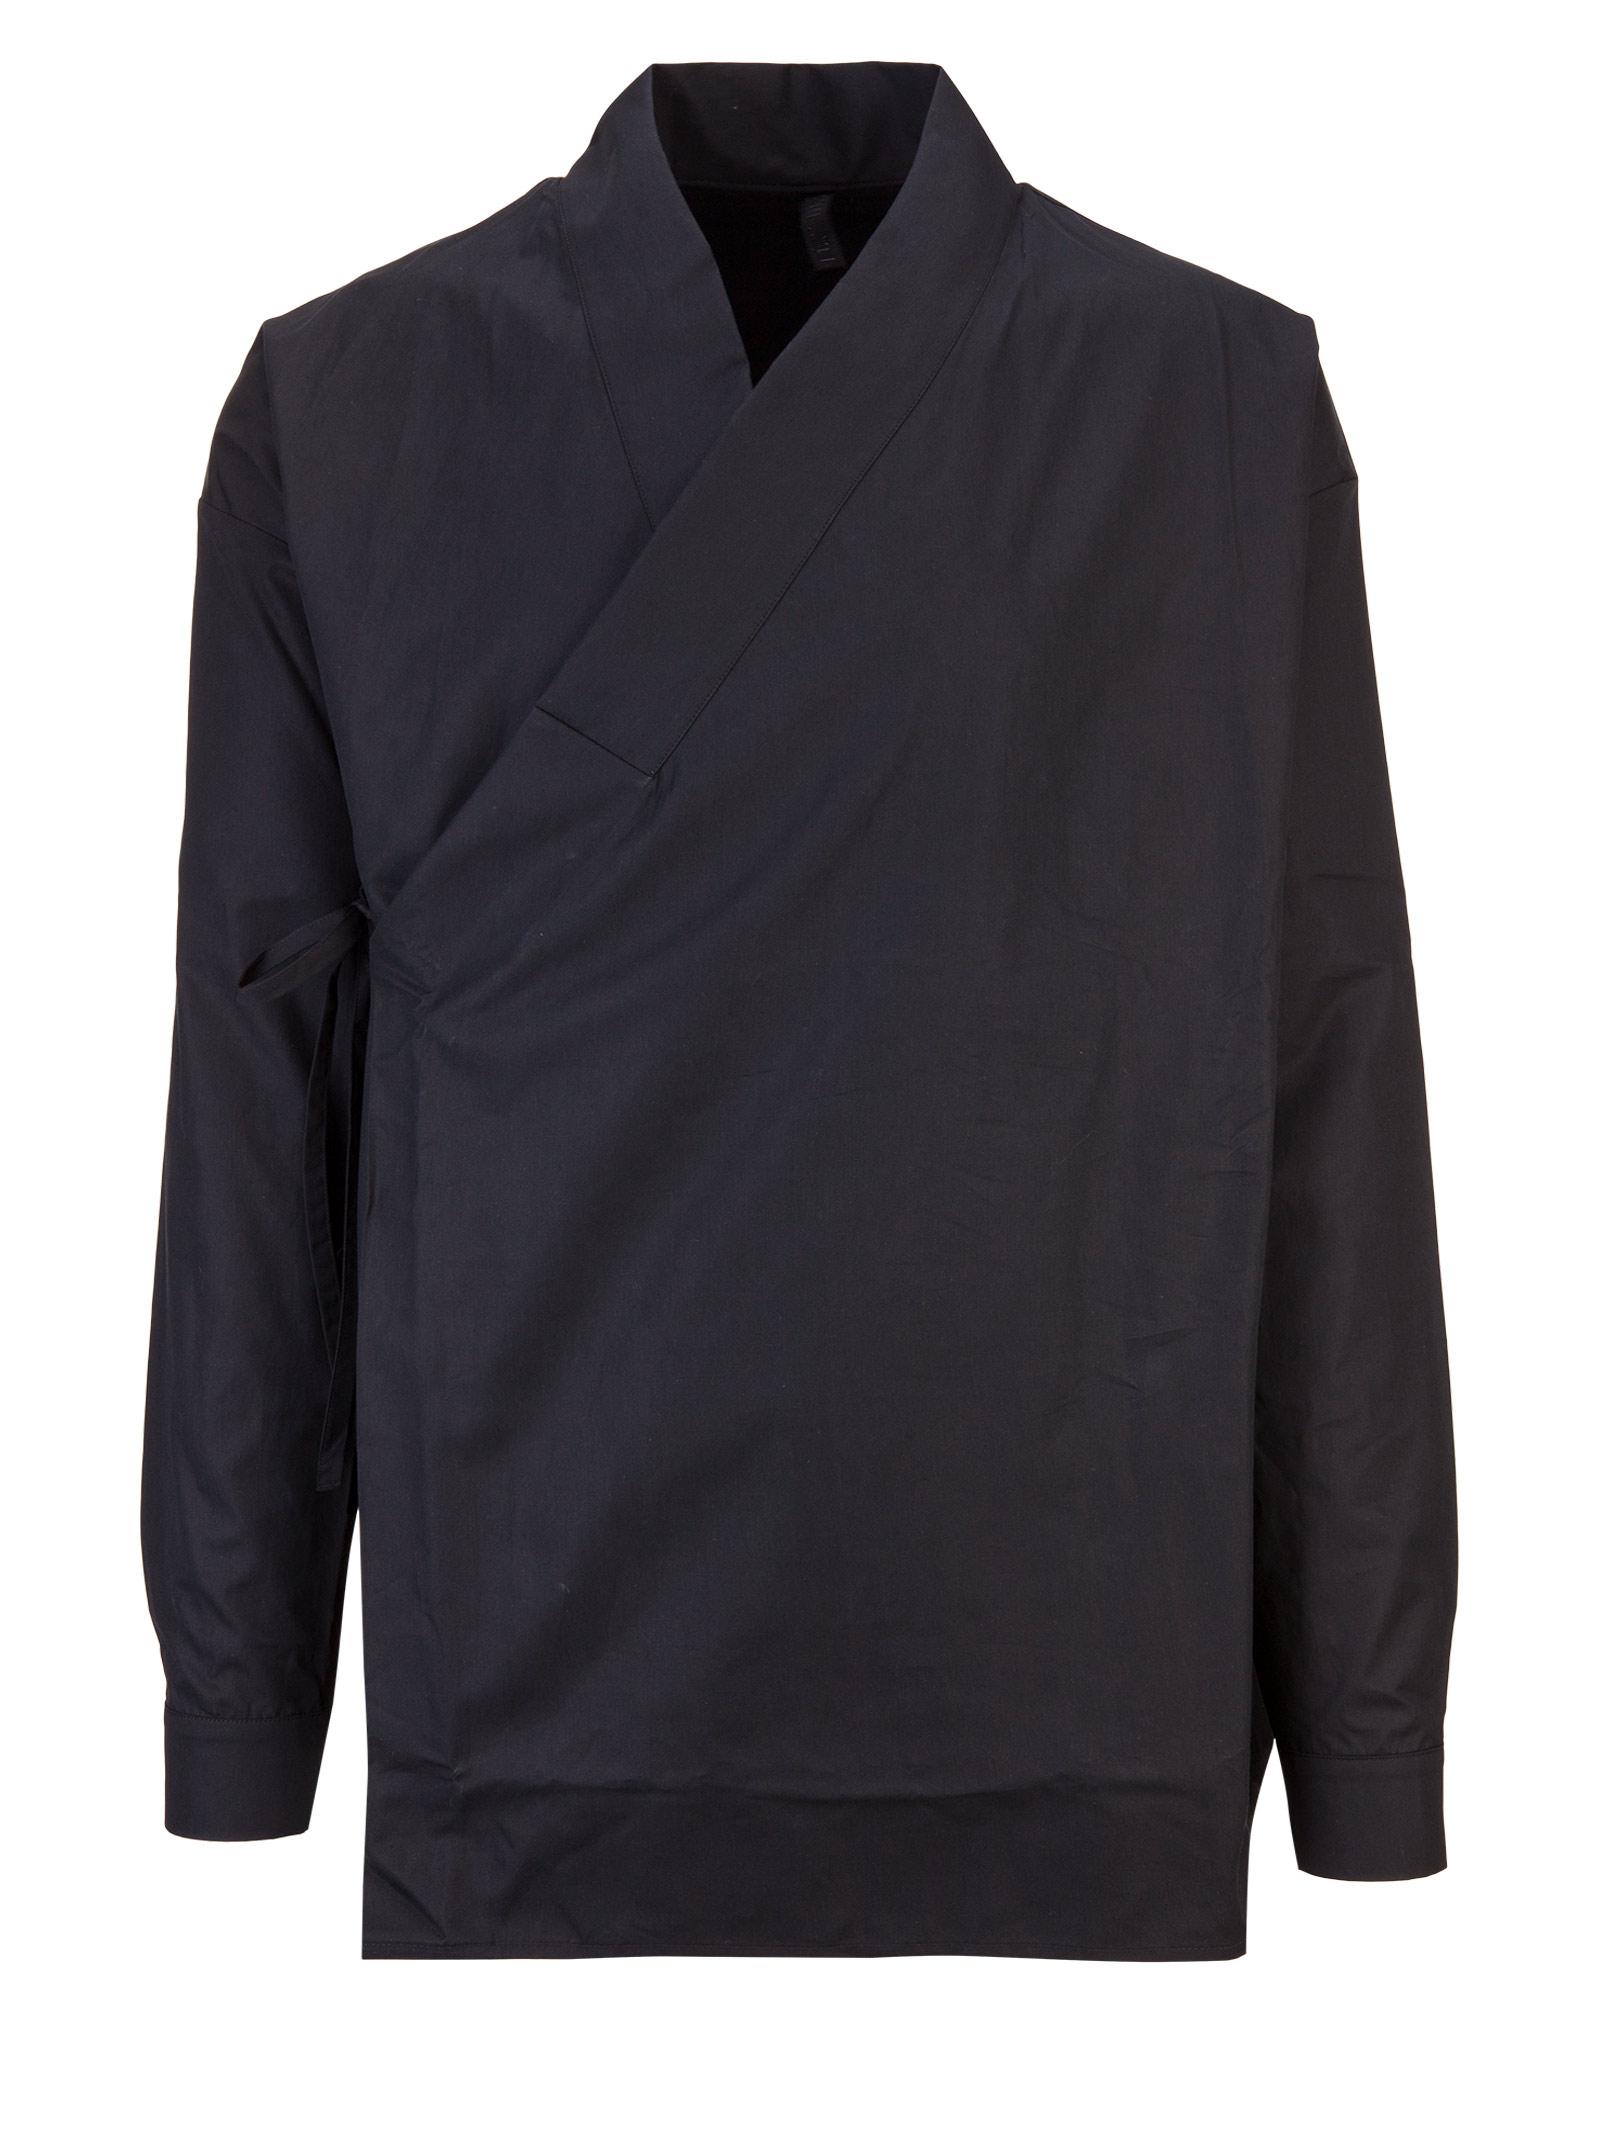 Ben Taverniti Unravel Project Shirt